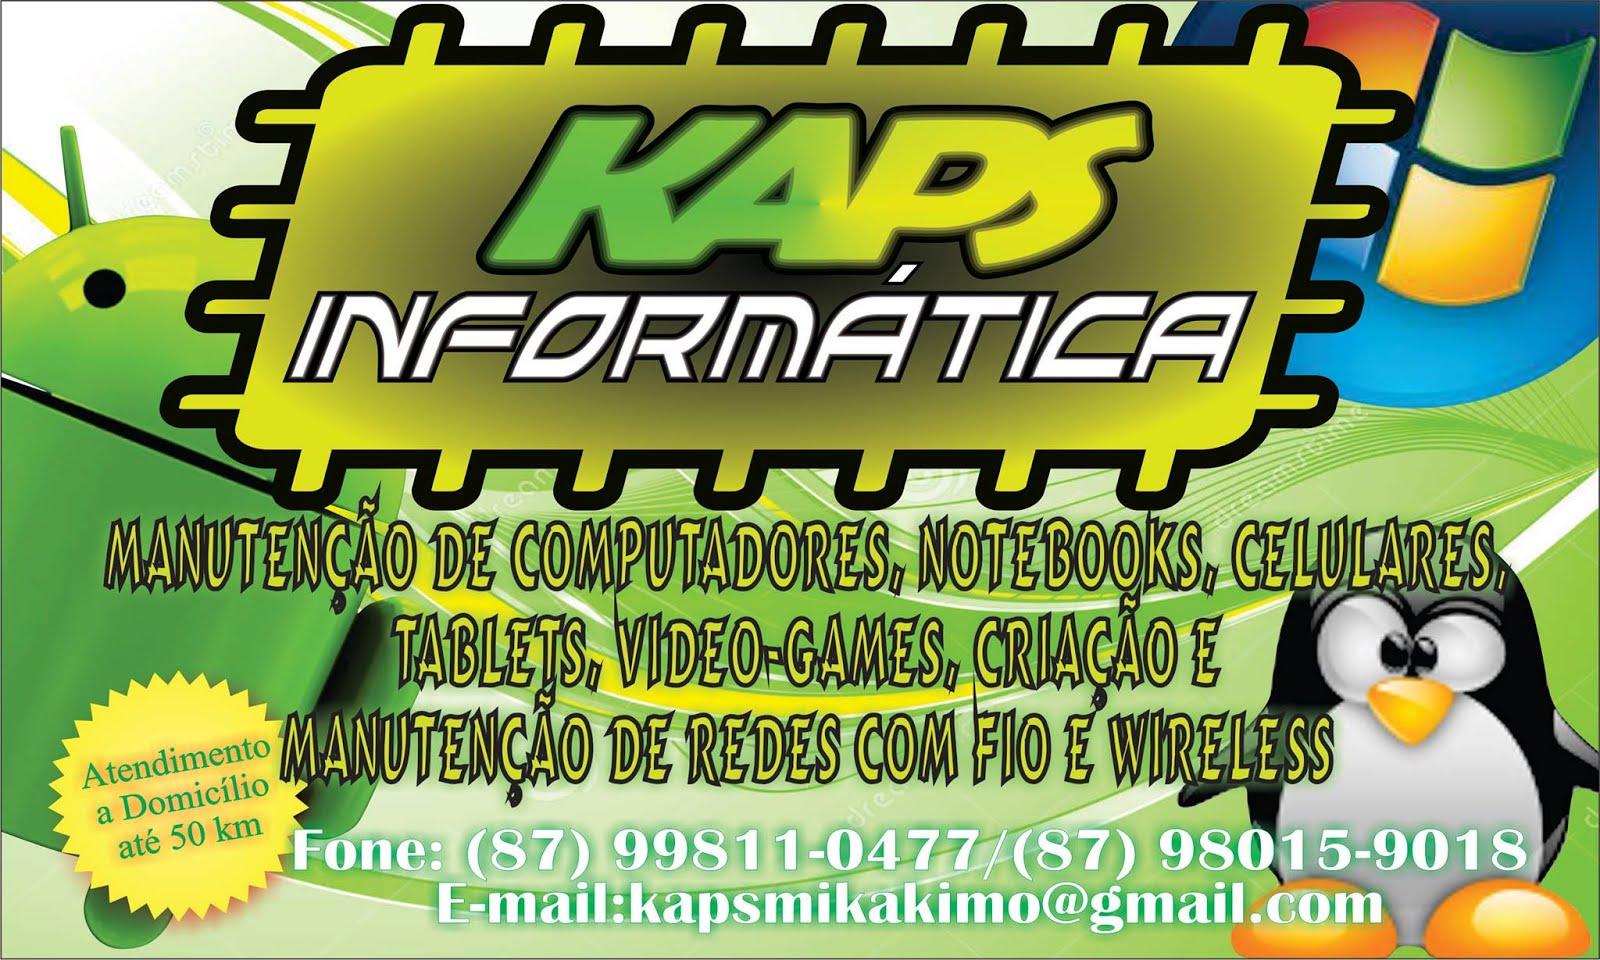 Kaps Informática.